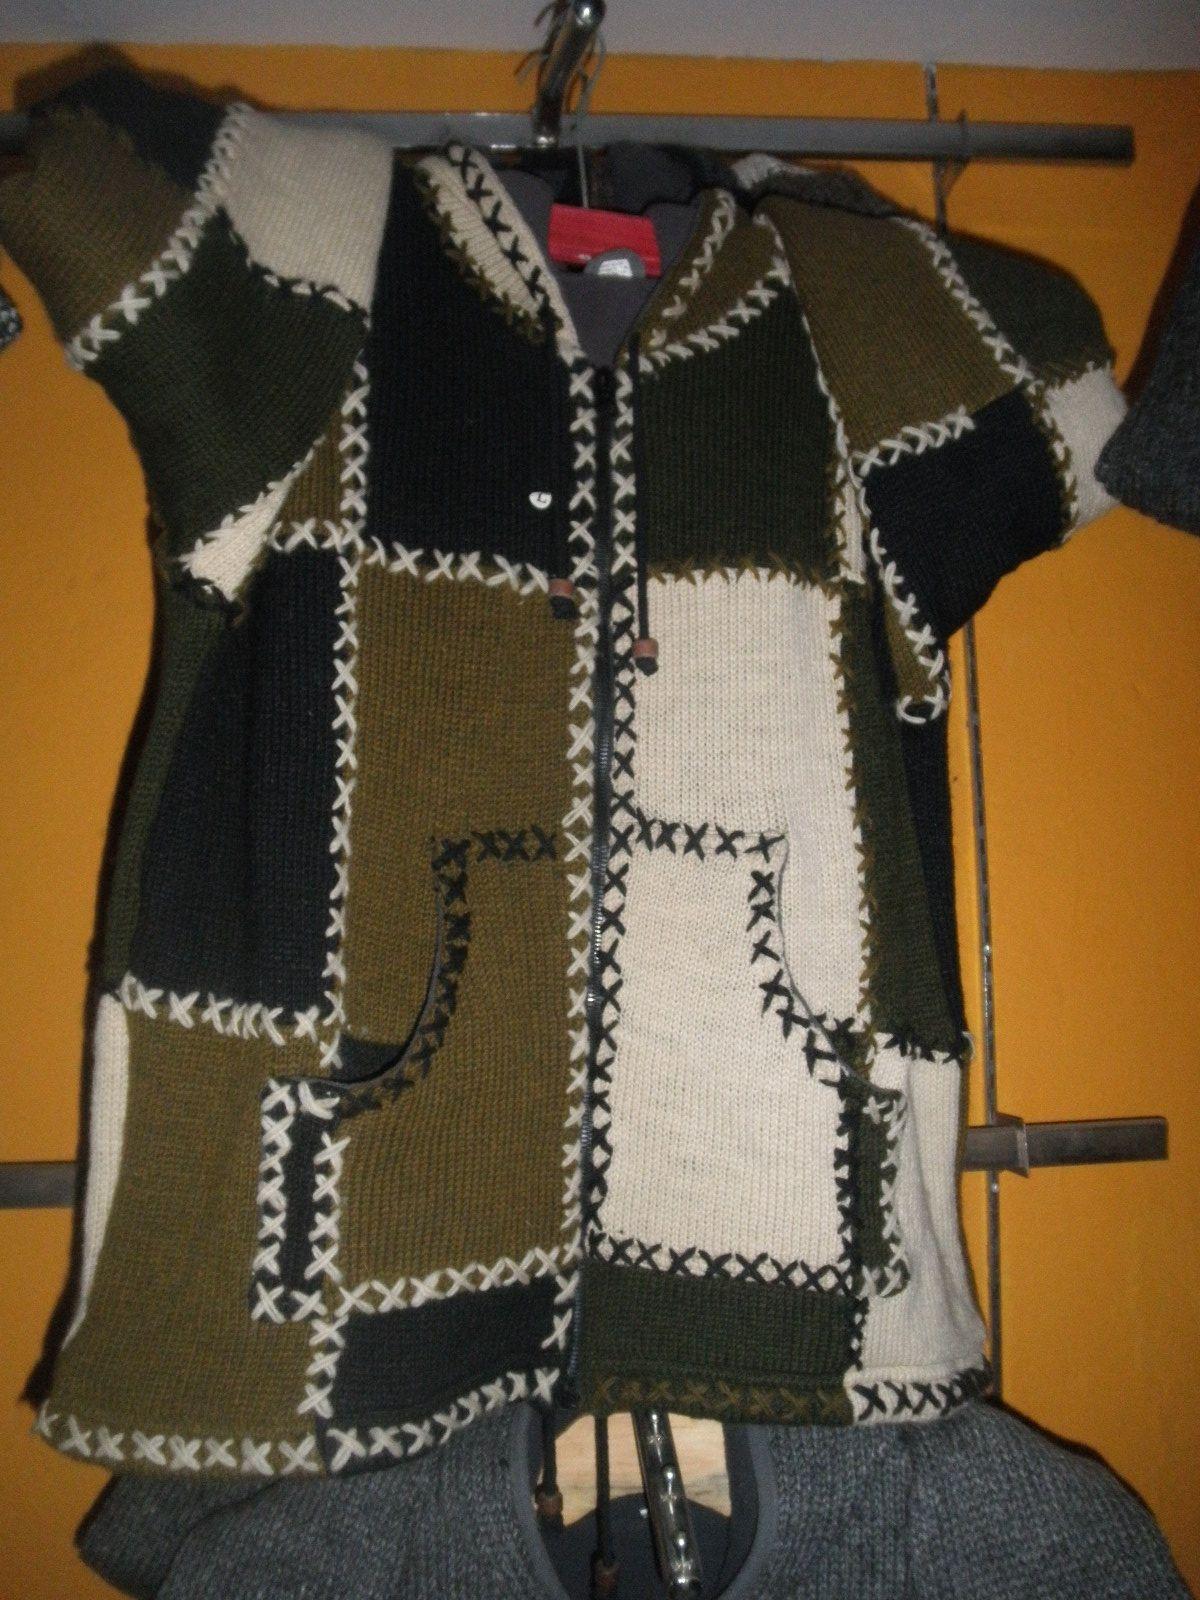 Sweater jacket wool sweaters from nepal wool coat nepal mens sweater jacket wool sweaters from nepal wool coat nepal mens wool jacket sheep wool knitting design patterns easy knitting designs bankloansurffo Gallery